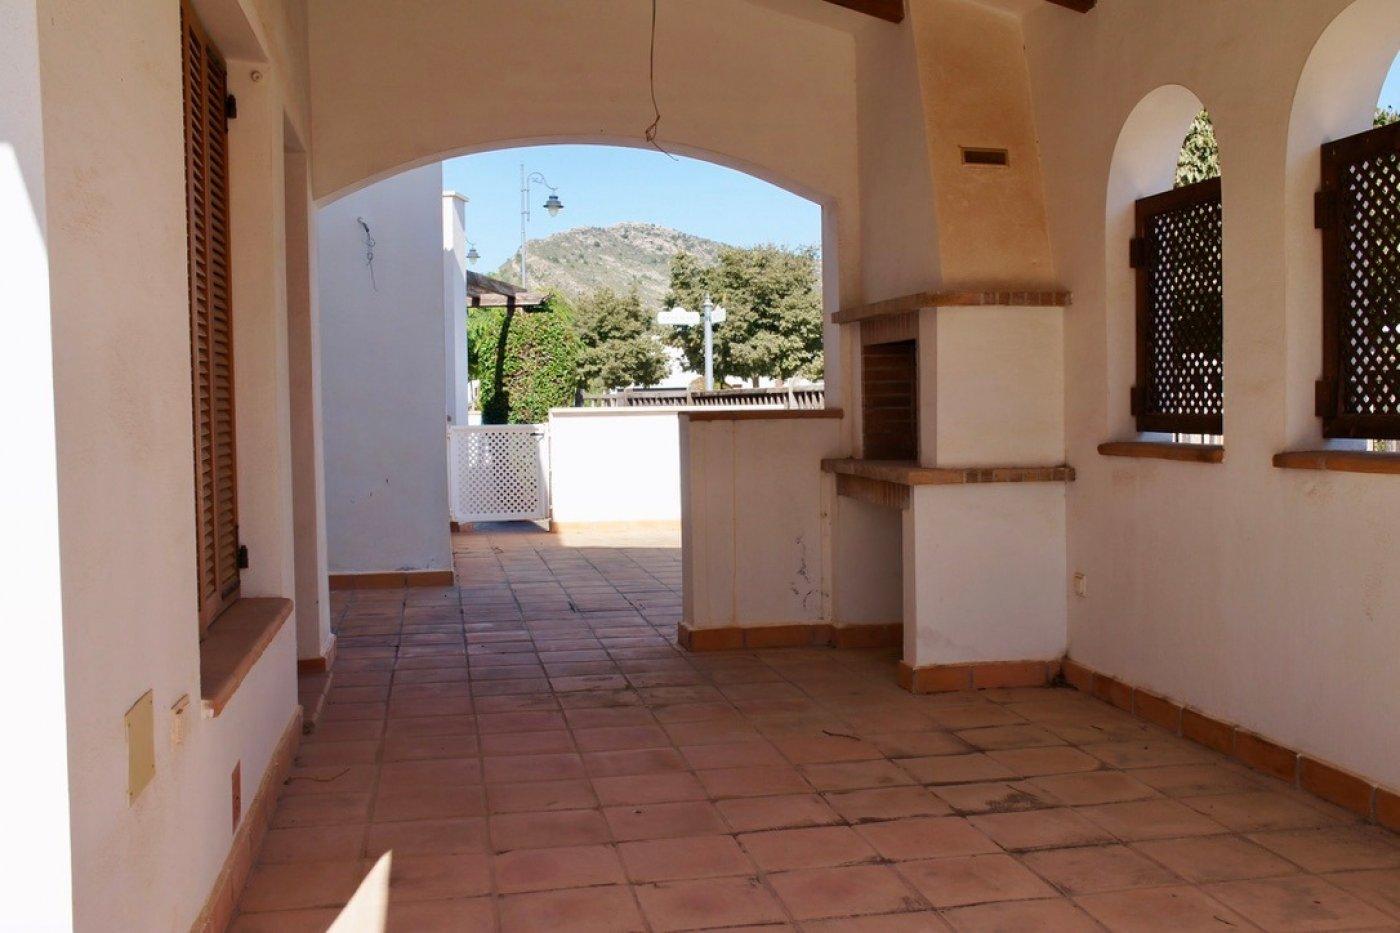 Gallery Image 4 of Fantastic offer - bank repossessed south facing villa on EL Valle Golf Resort